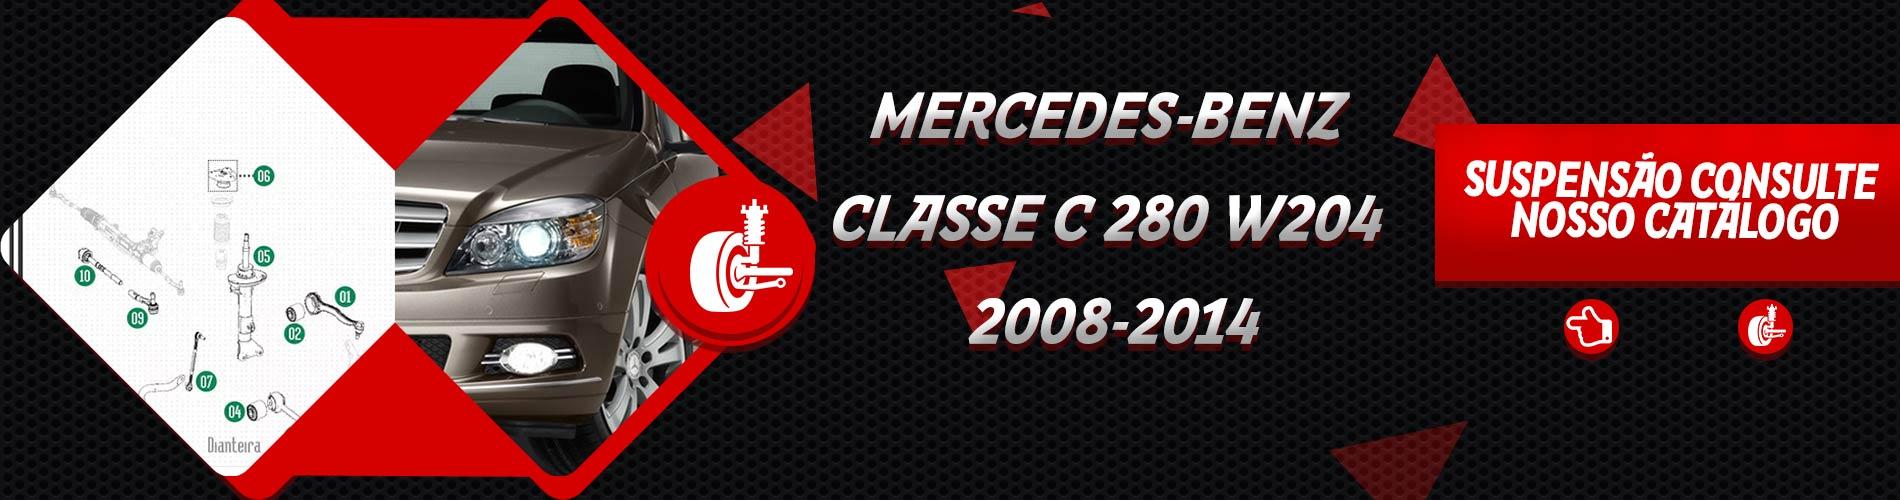 Catálogo MERCEDES-BENZ